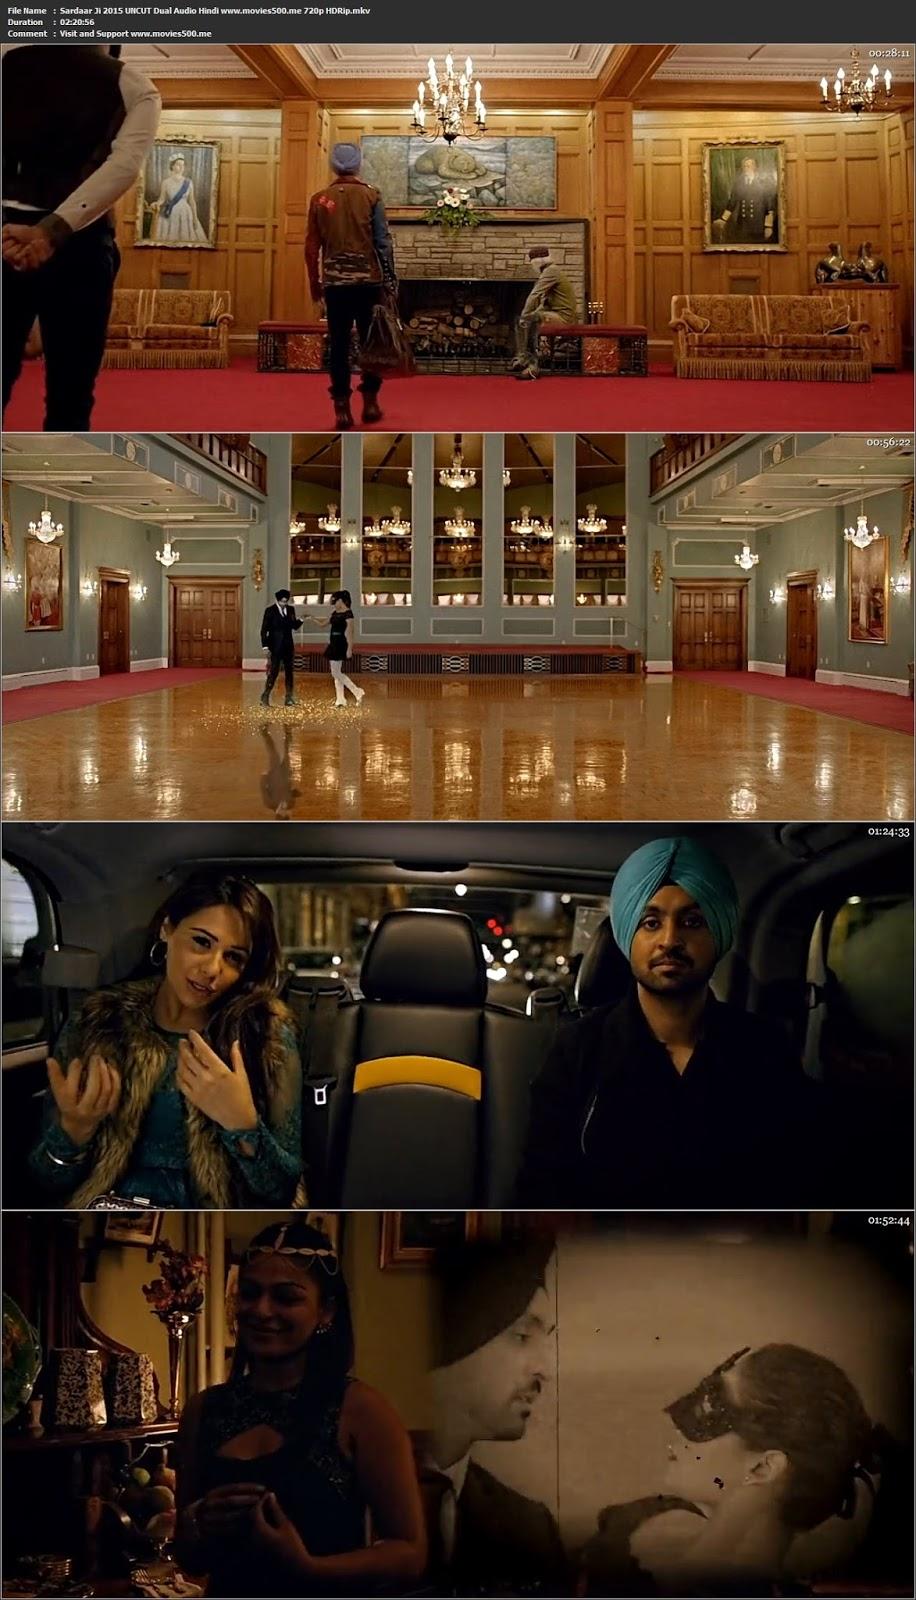 Sardaar Ji 2015 UNCUT Punjabi Movie HDRip 720p 1.4GB at movies500.xyz